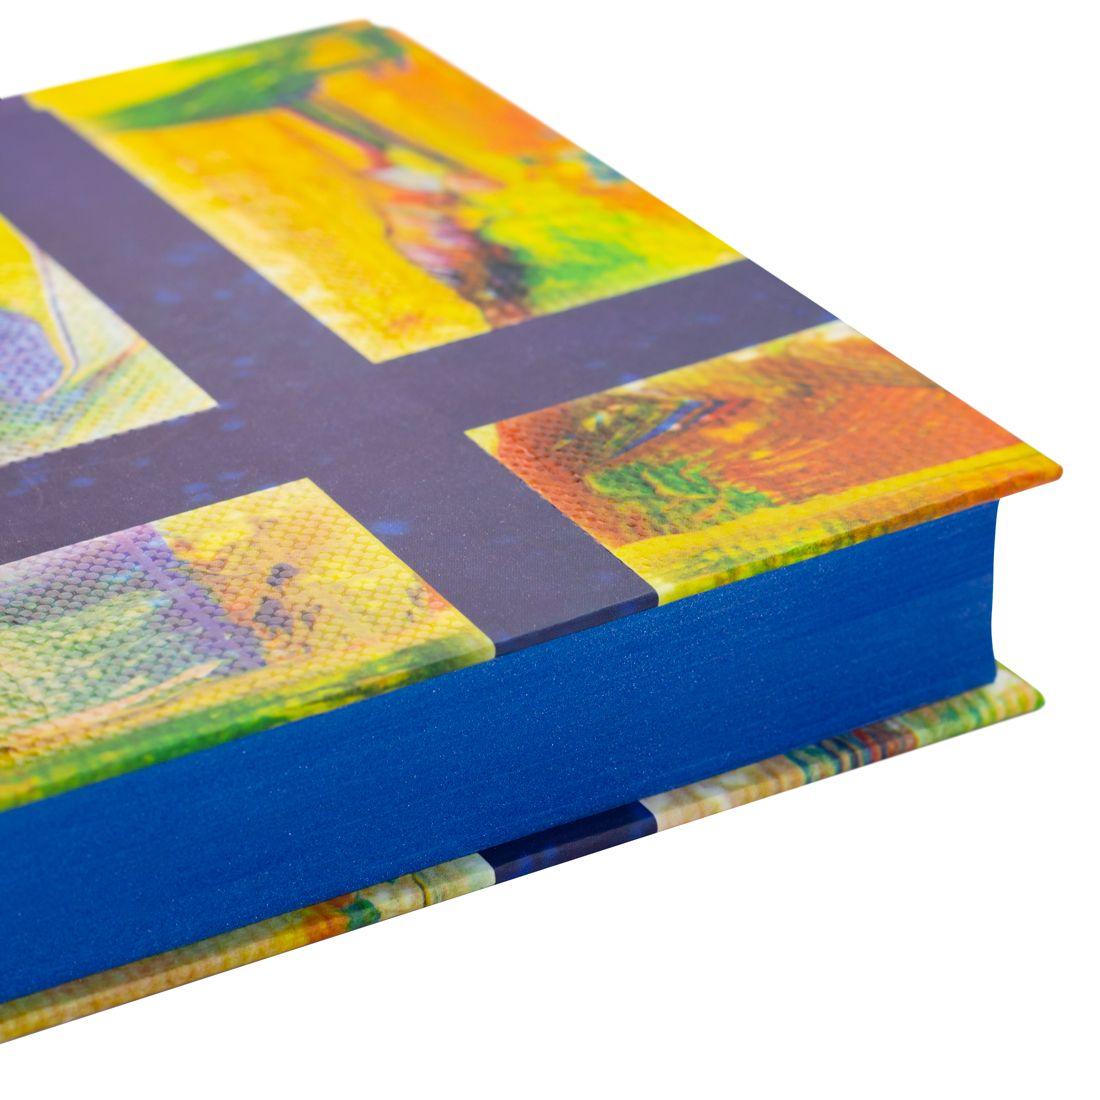 Bíblia Sagrada - Bandeira  - Universo Bíblico Rs